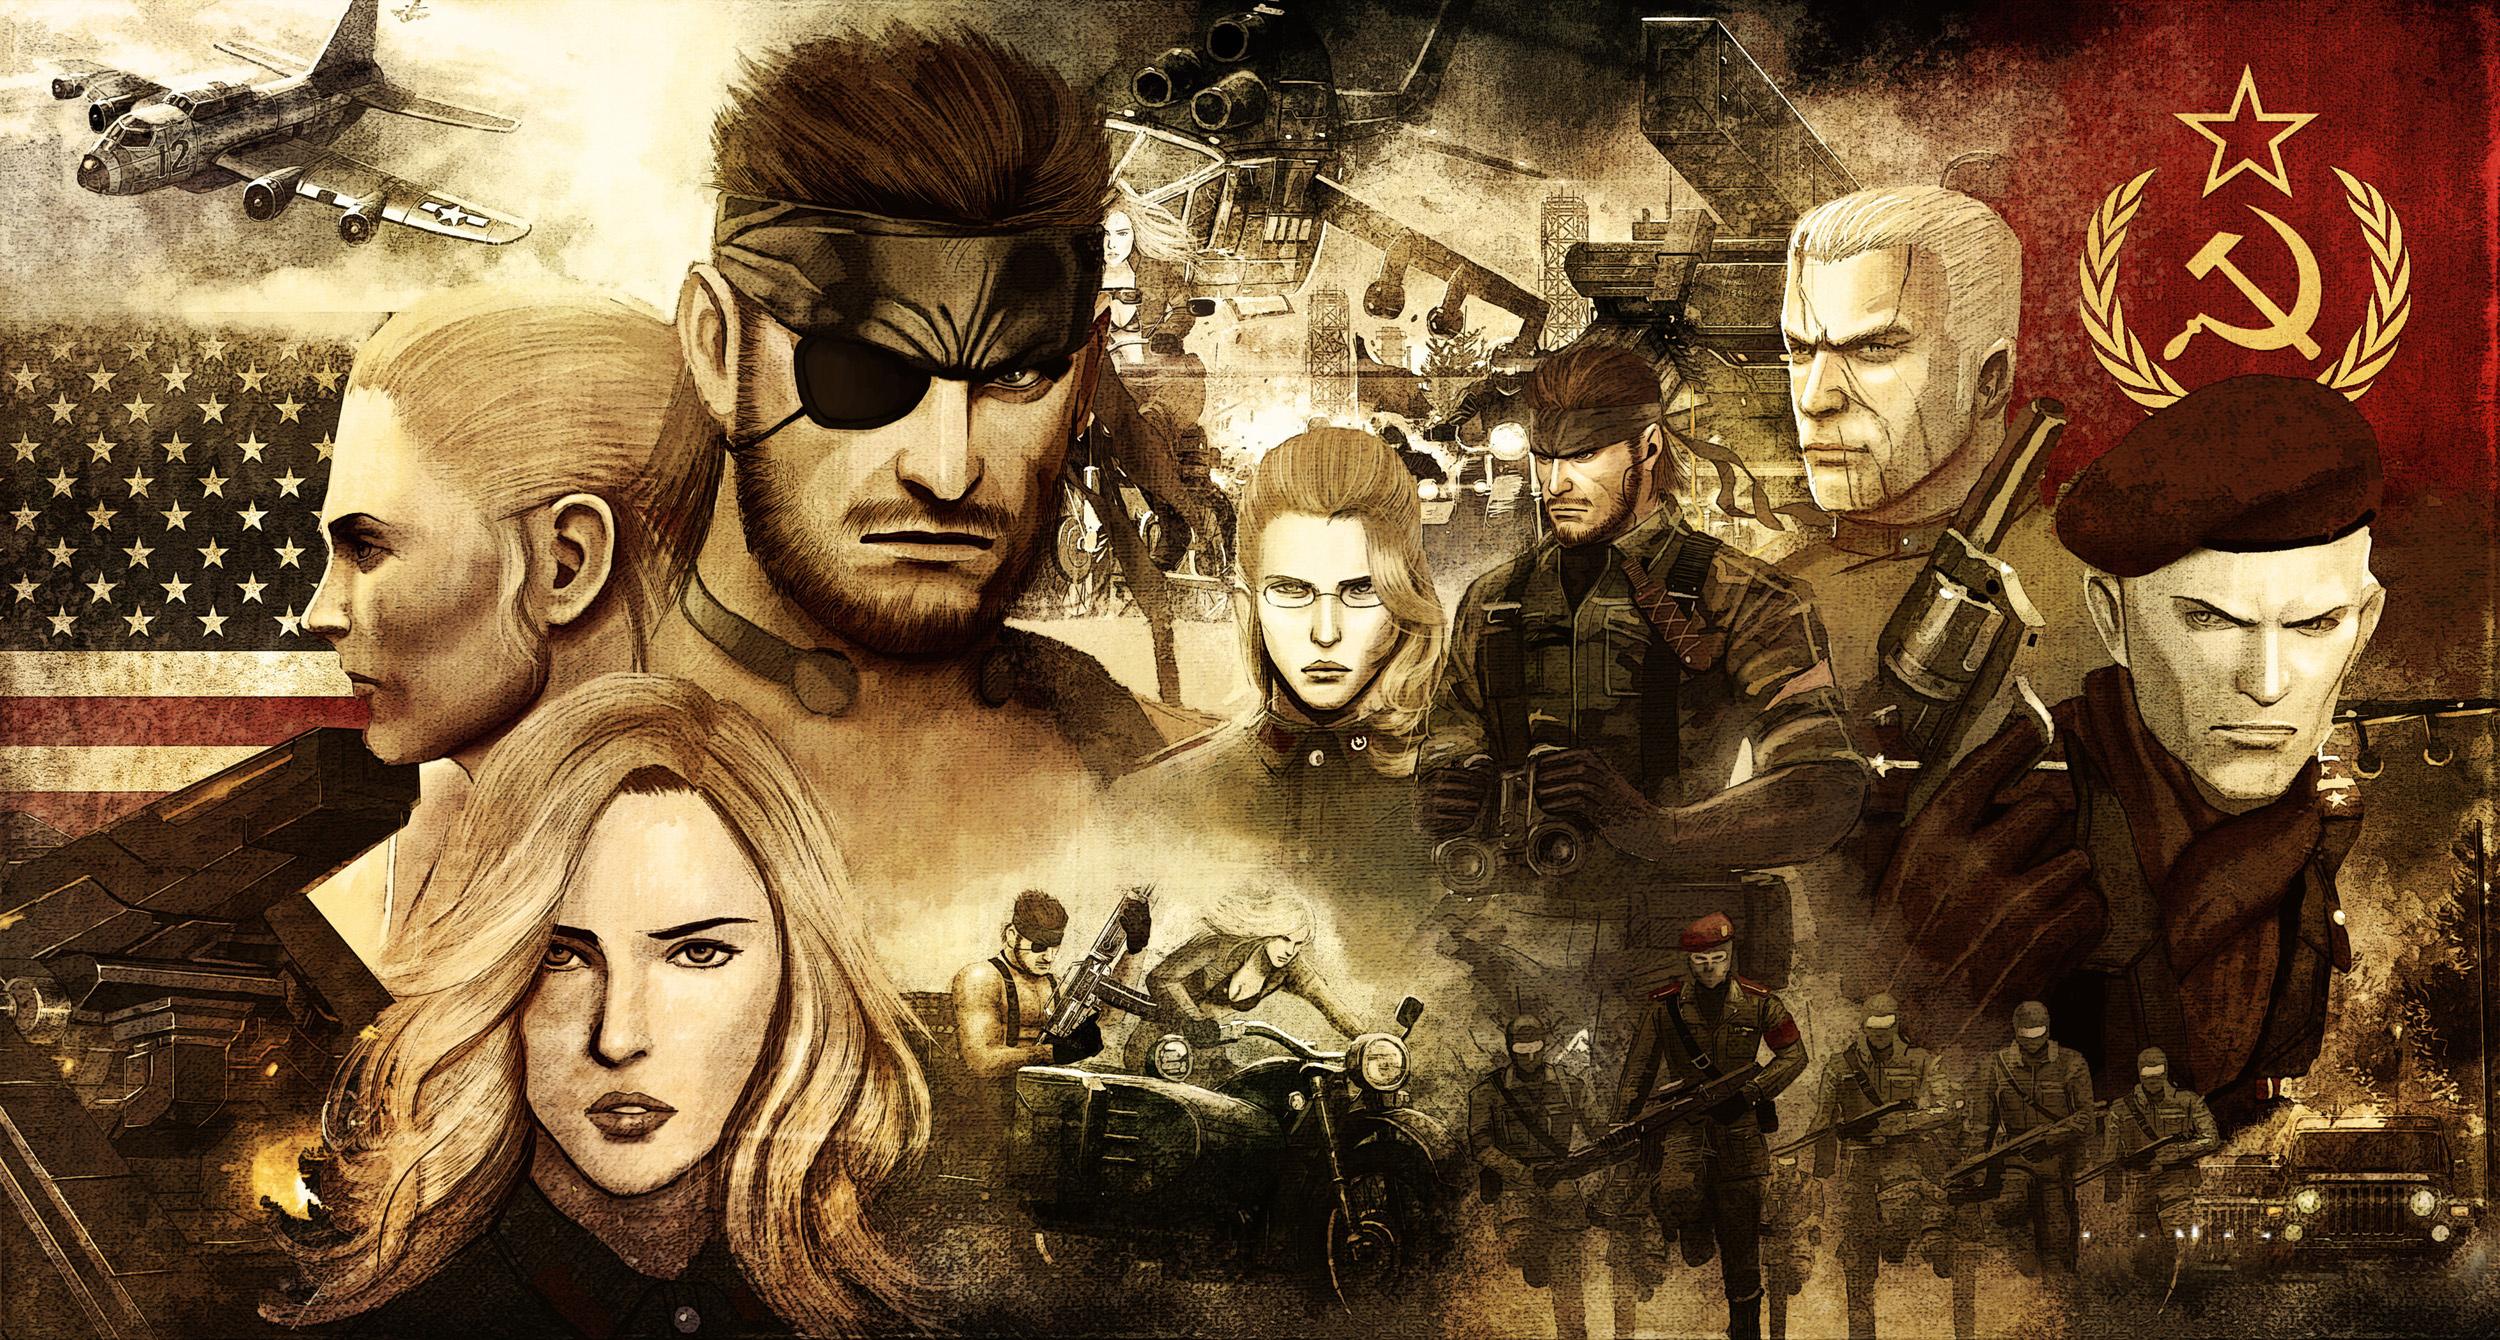 Metal Gear Solid 3 Snake Eater Art Id 78492 Art Abyss